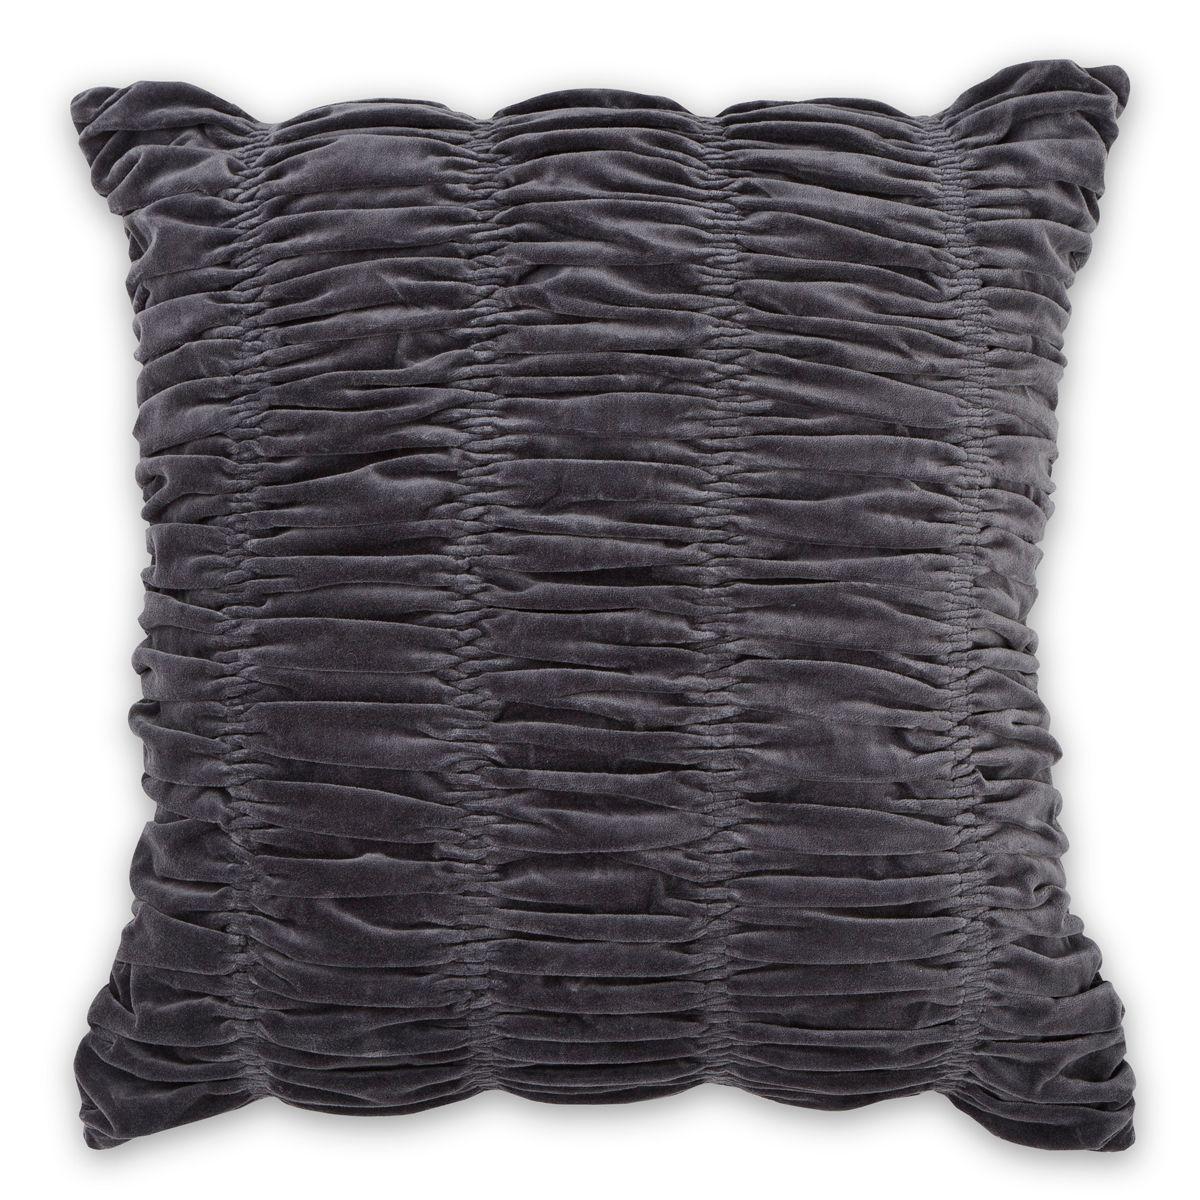 Gorgeous Gathered Velvet cushions in Smoke!